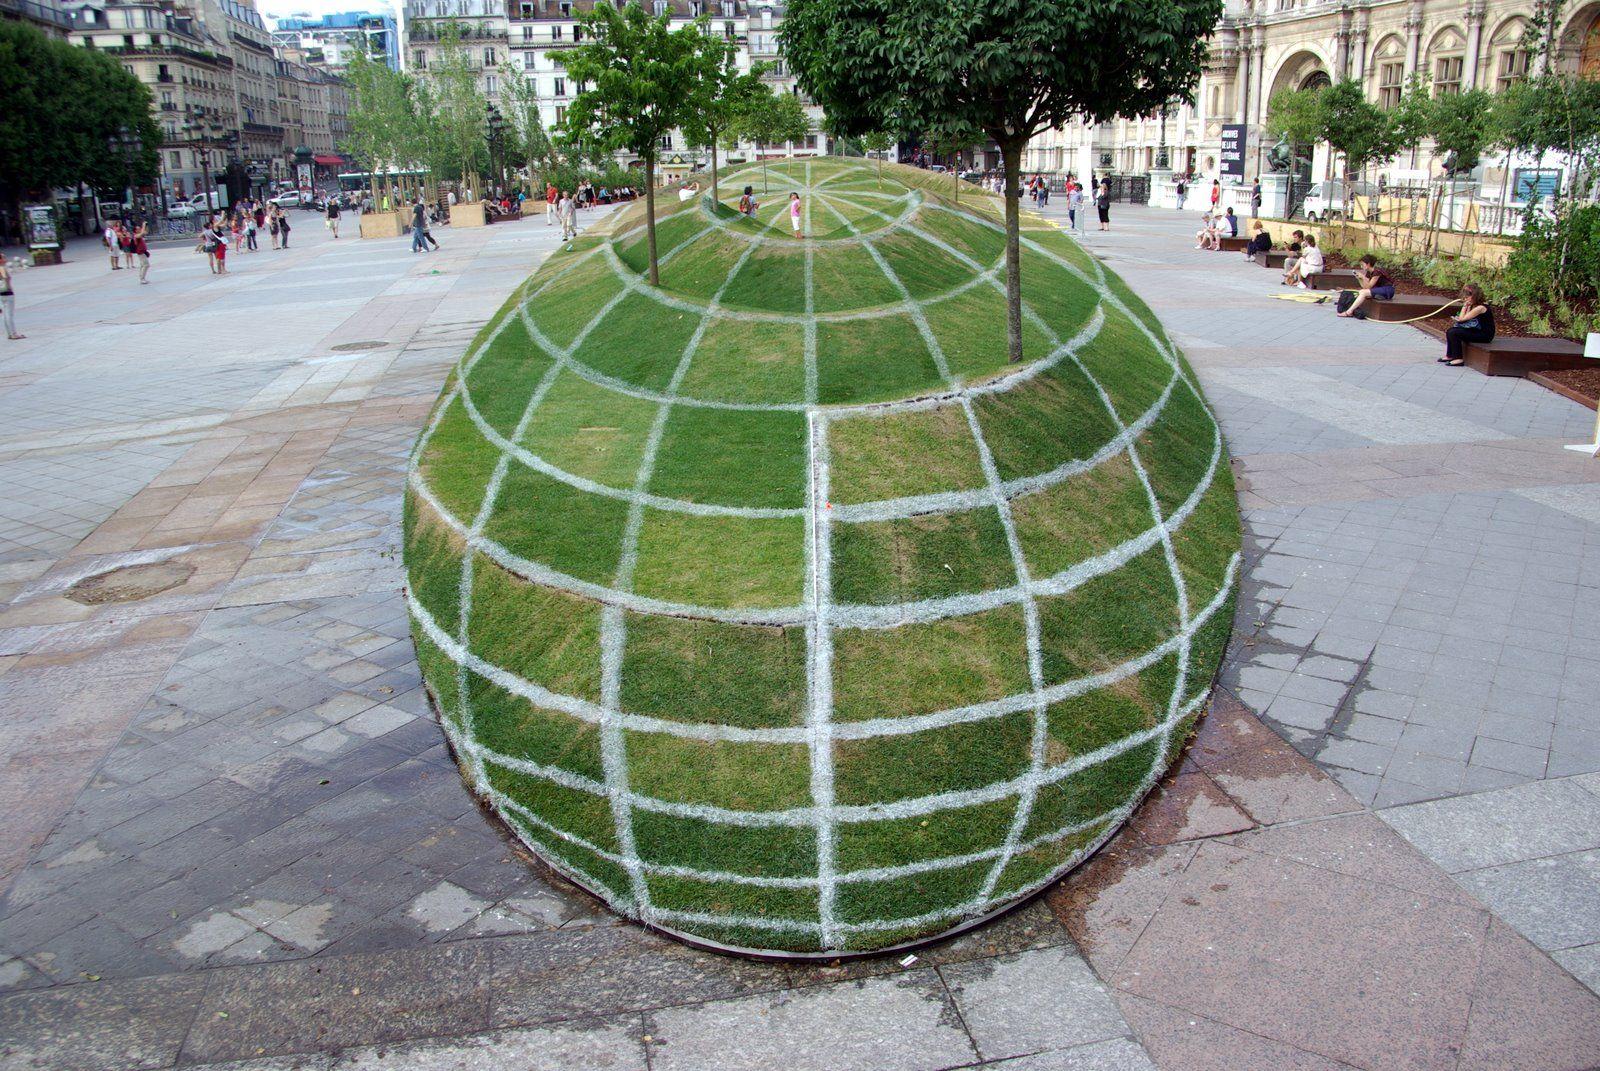 Just an optical illusion in Paris.